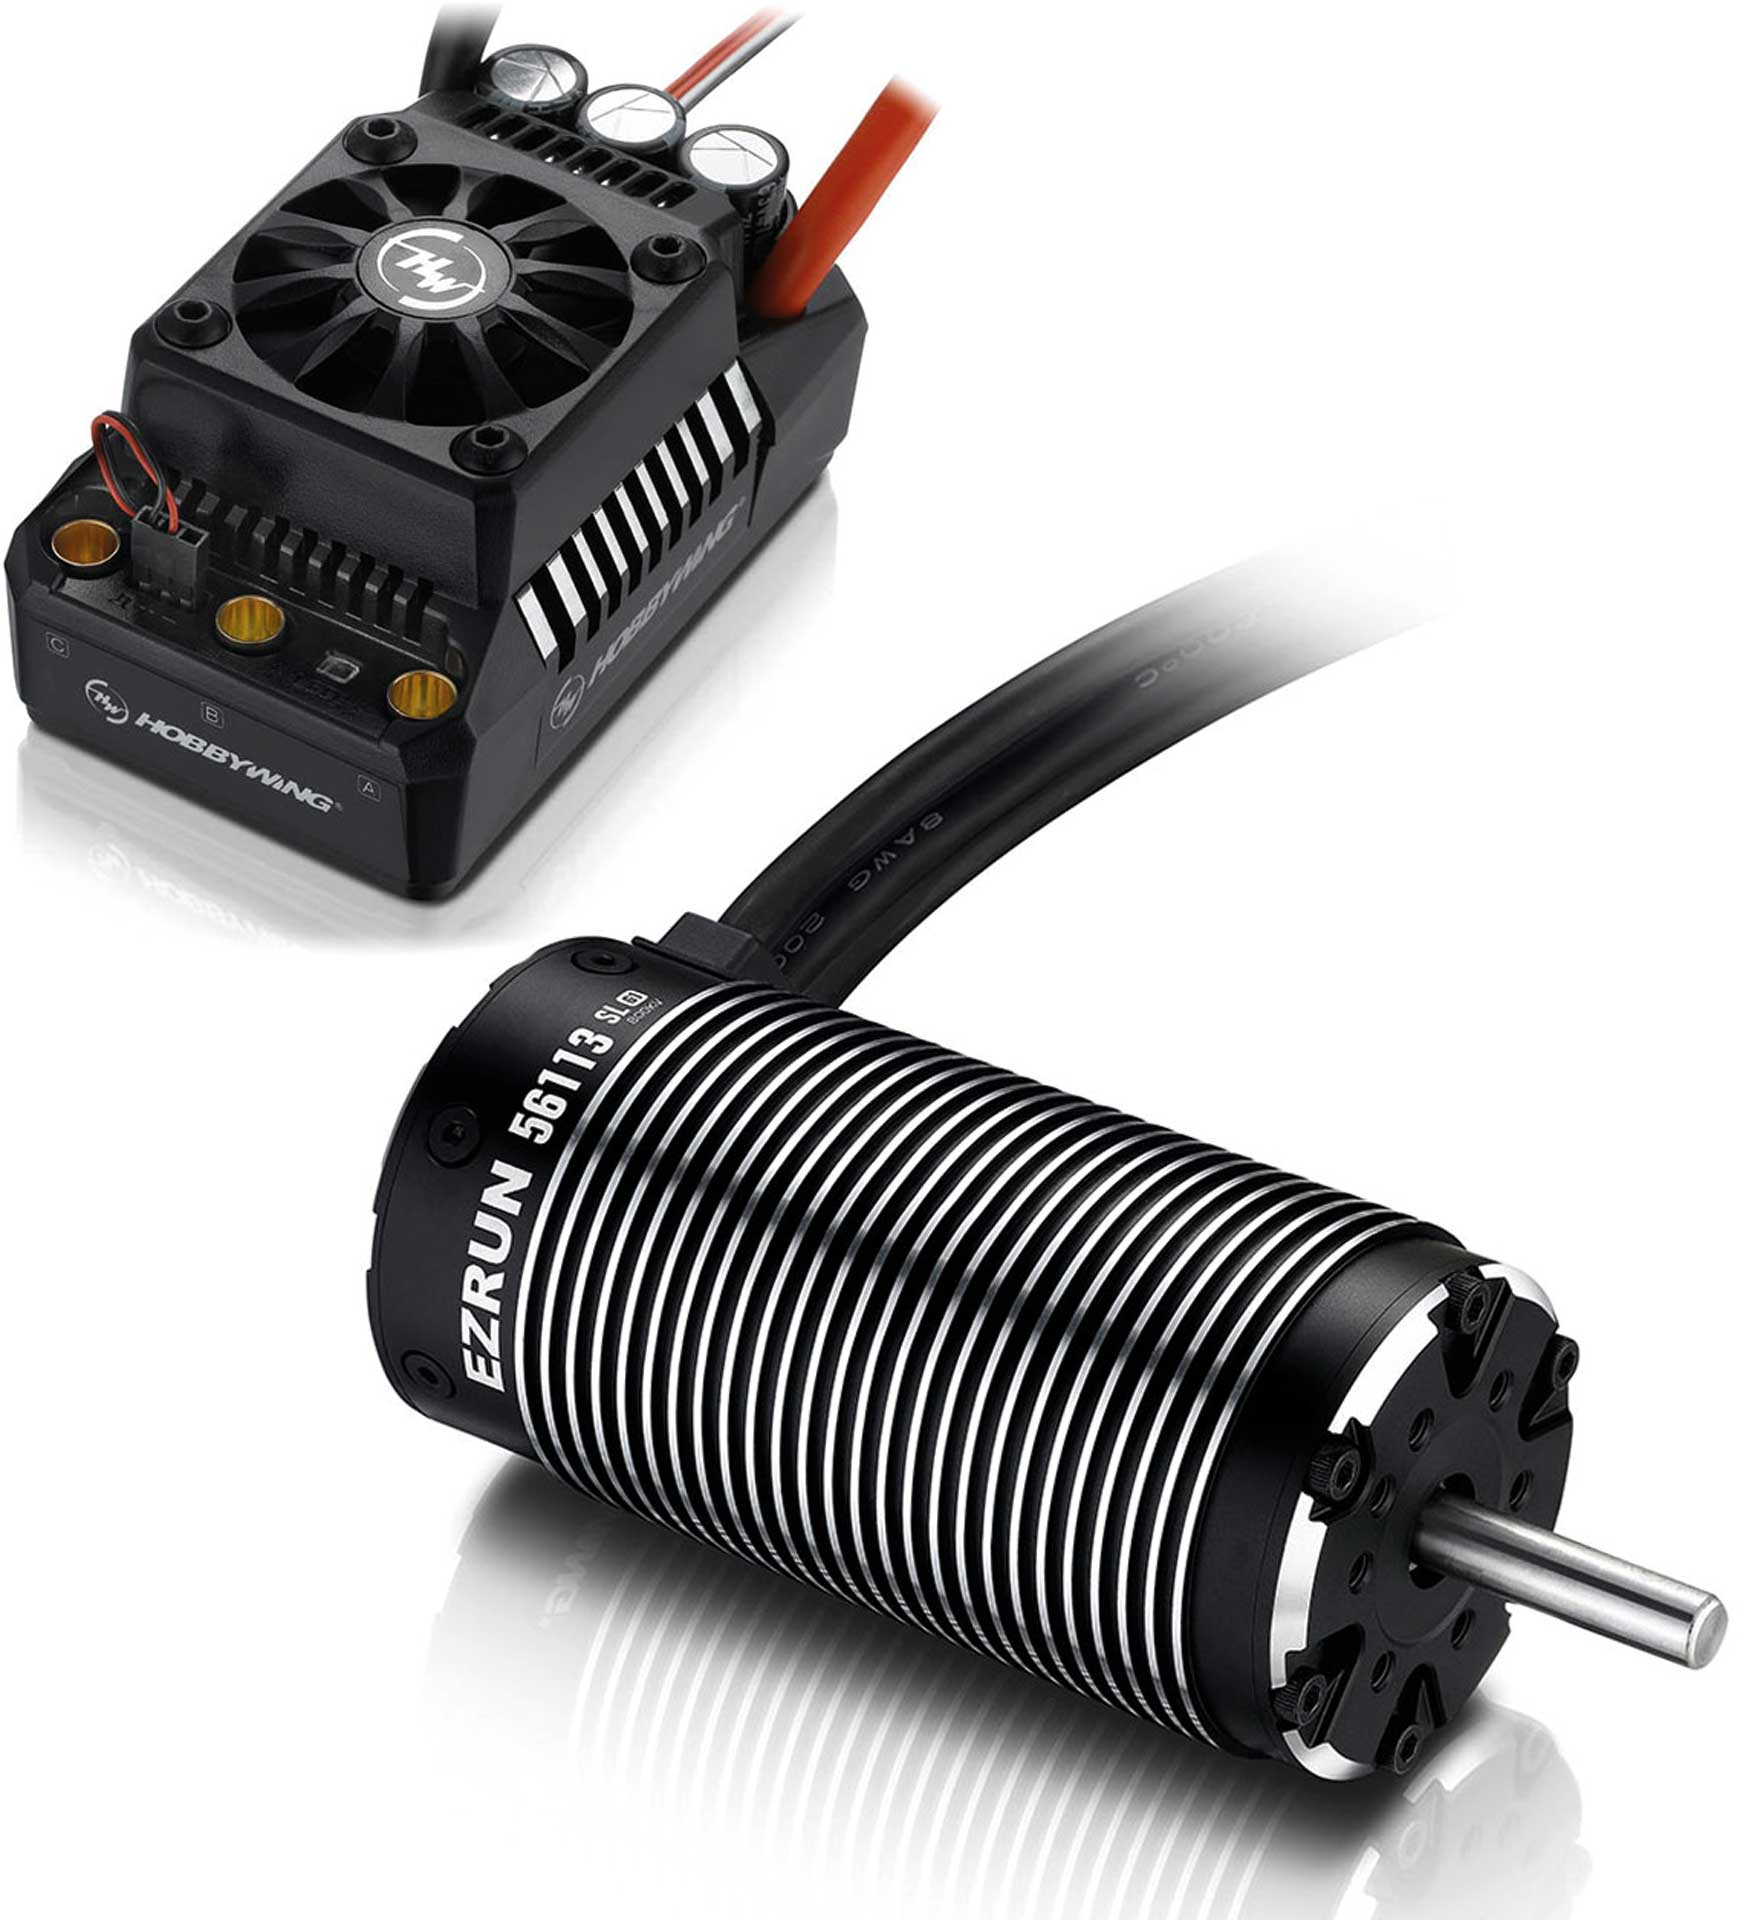 HOBBYWING Ezrun MAX5 Combo SL 56113 800kV Sensorless